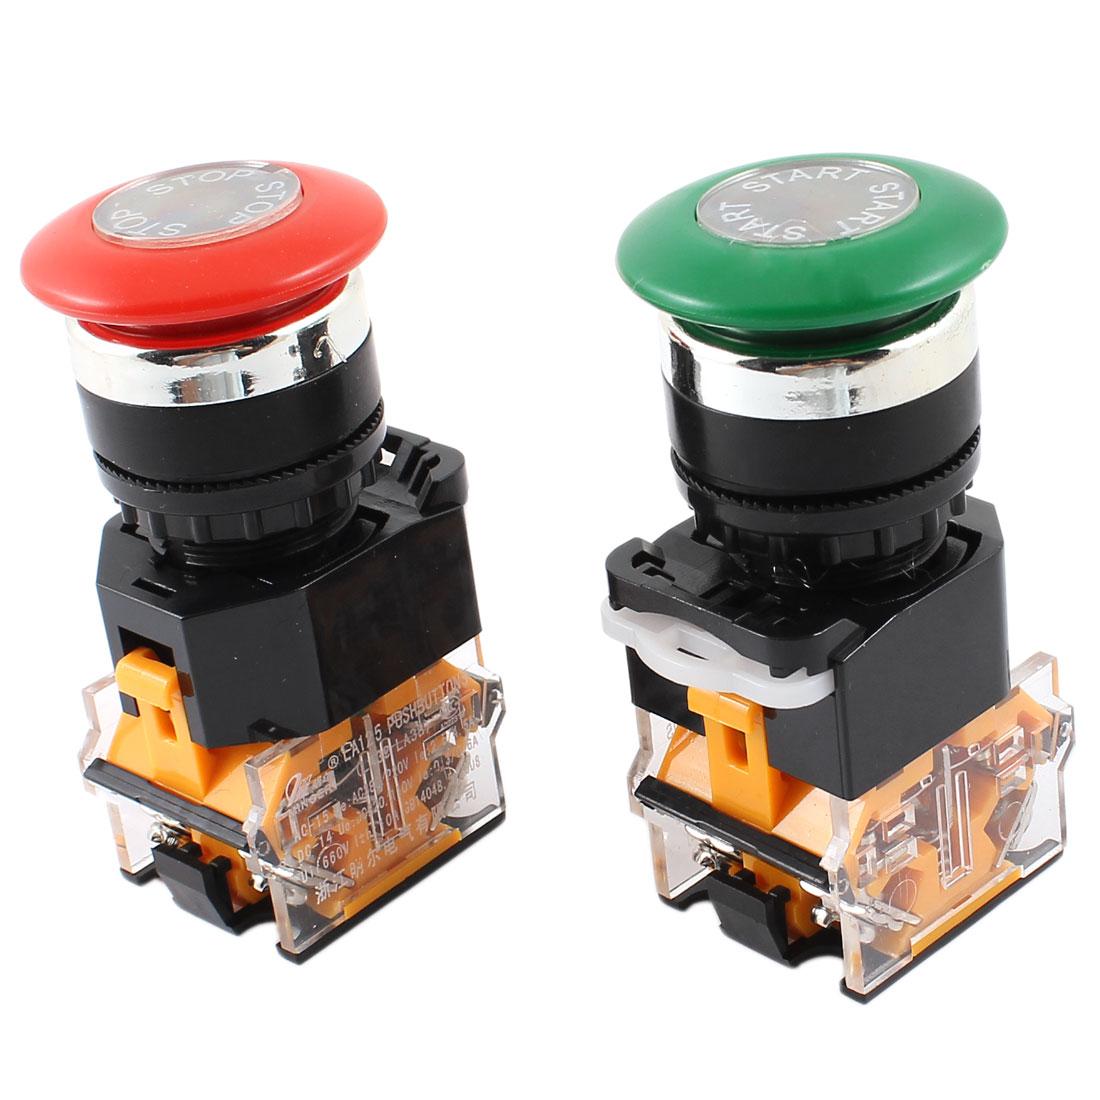 AC 660V 10A DPST NO+NC Red Green Mushroom Cap Emergency Stop Switch 2Pcs